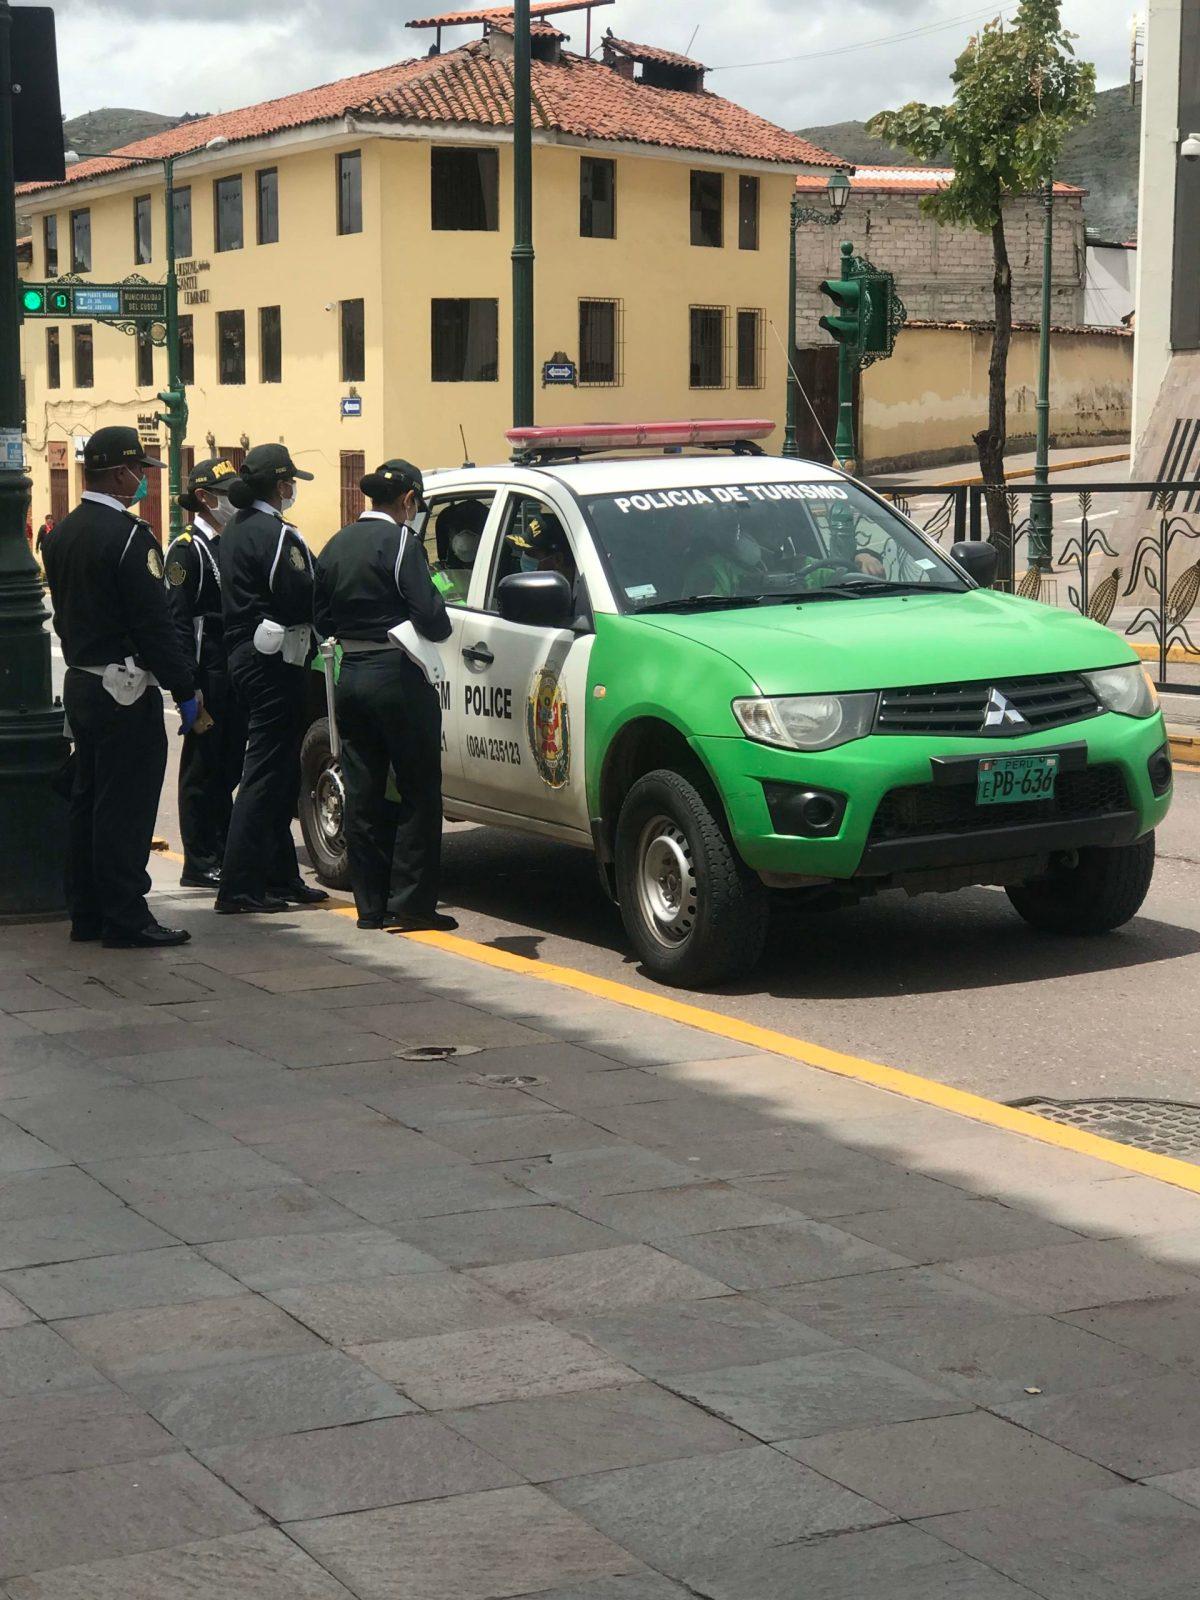 Peru in Lockdown